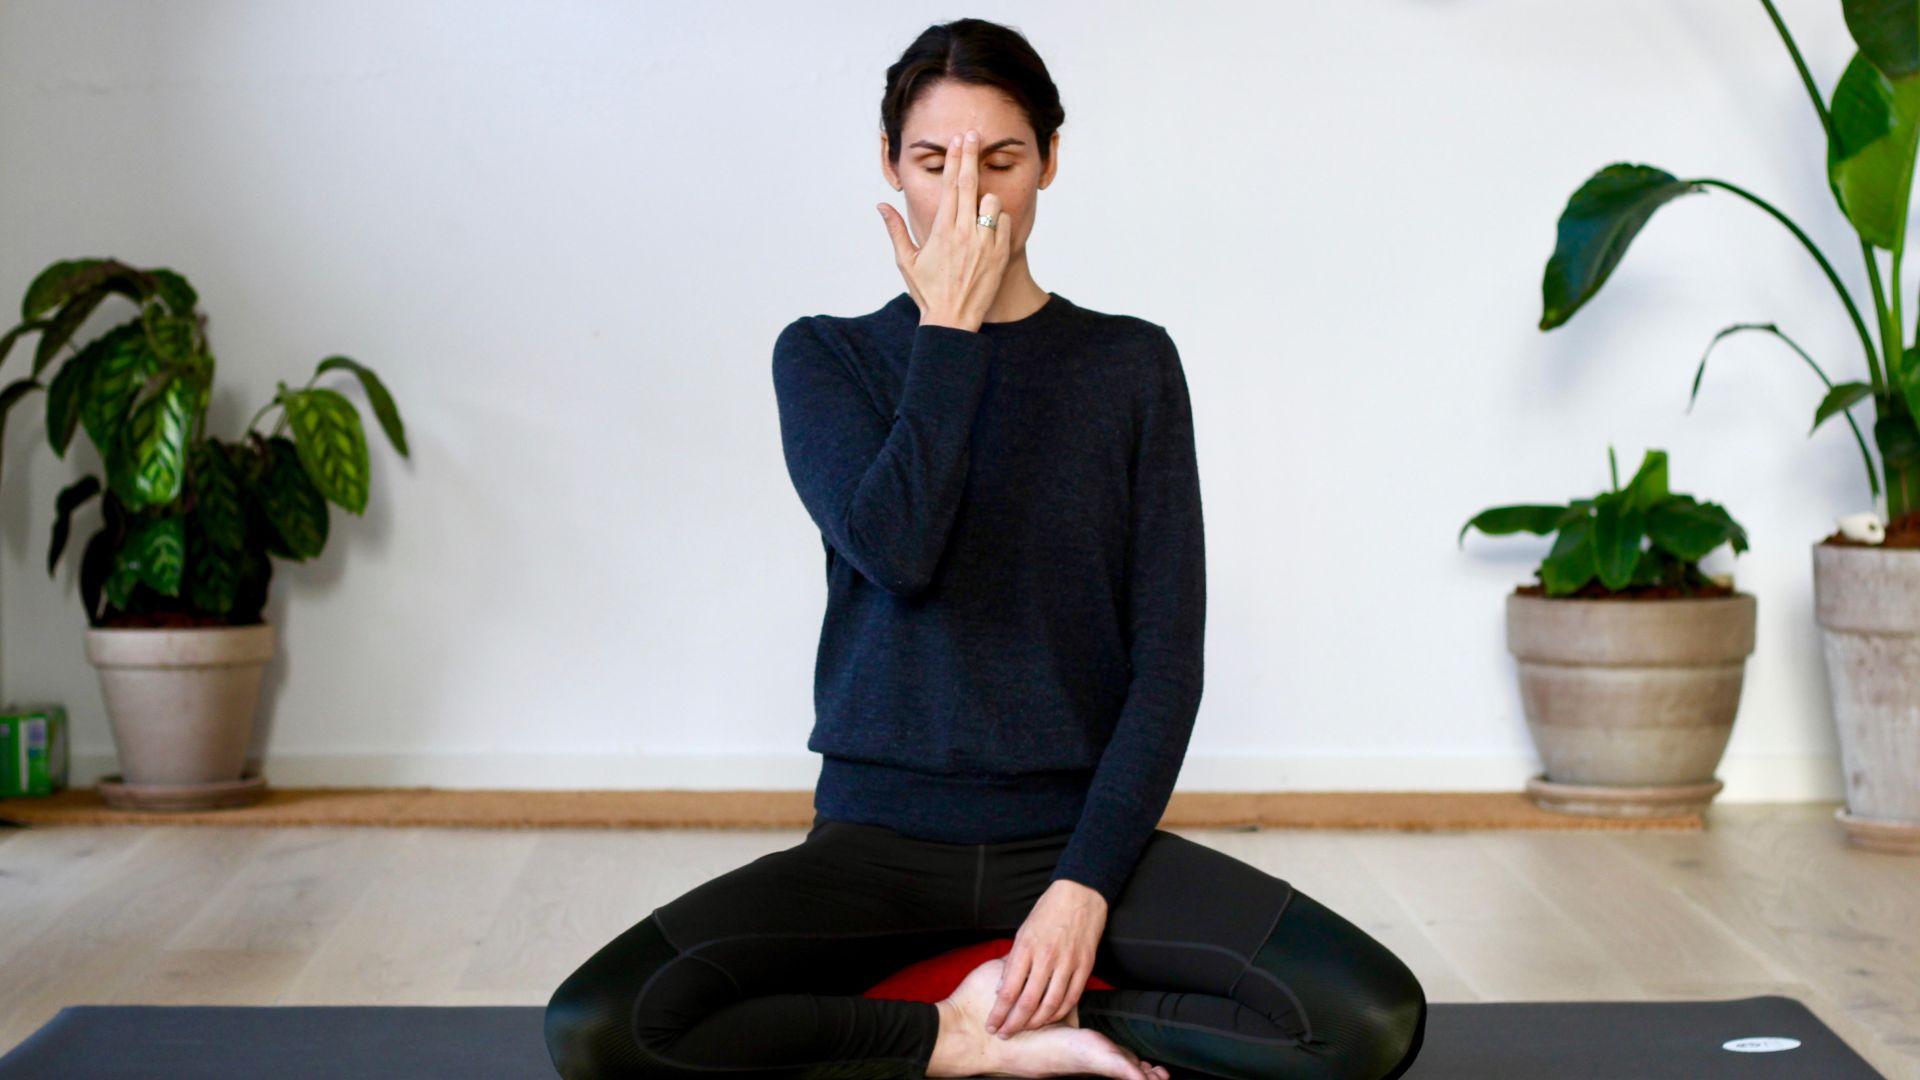 Har du prøvet meditation?